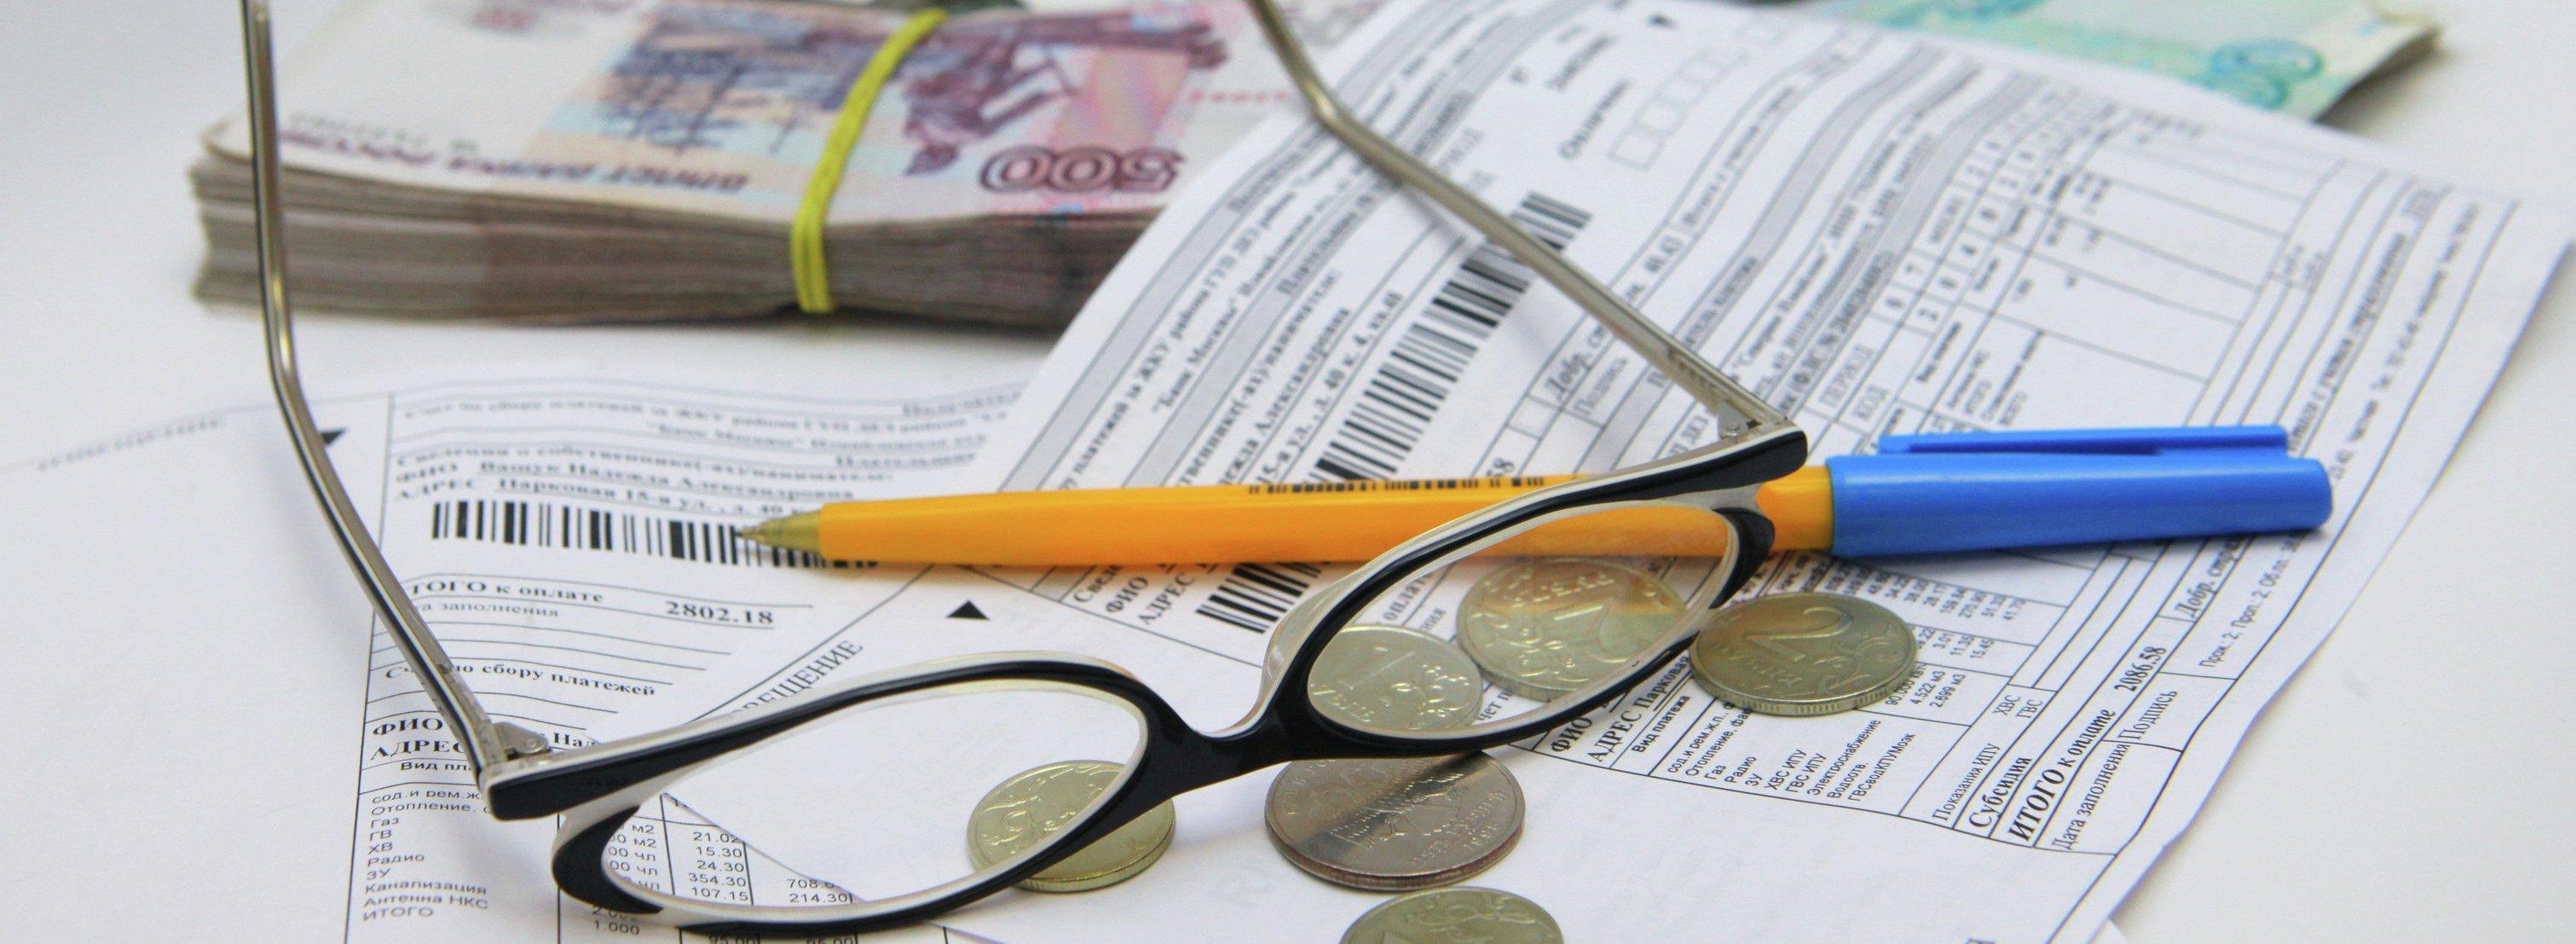 Госдума утвердила выдачу 4,4 млрд рублей на увеличение зарплат